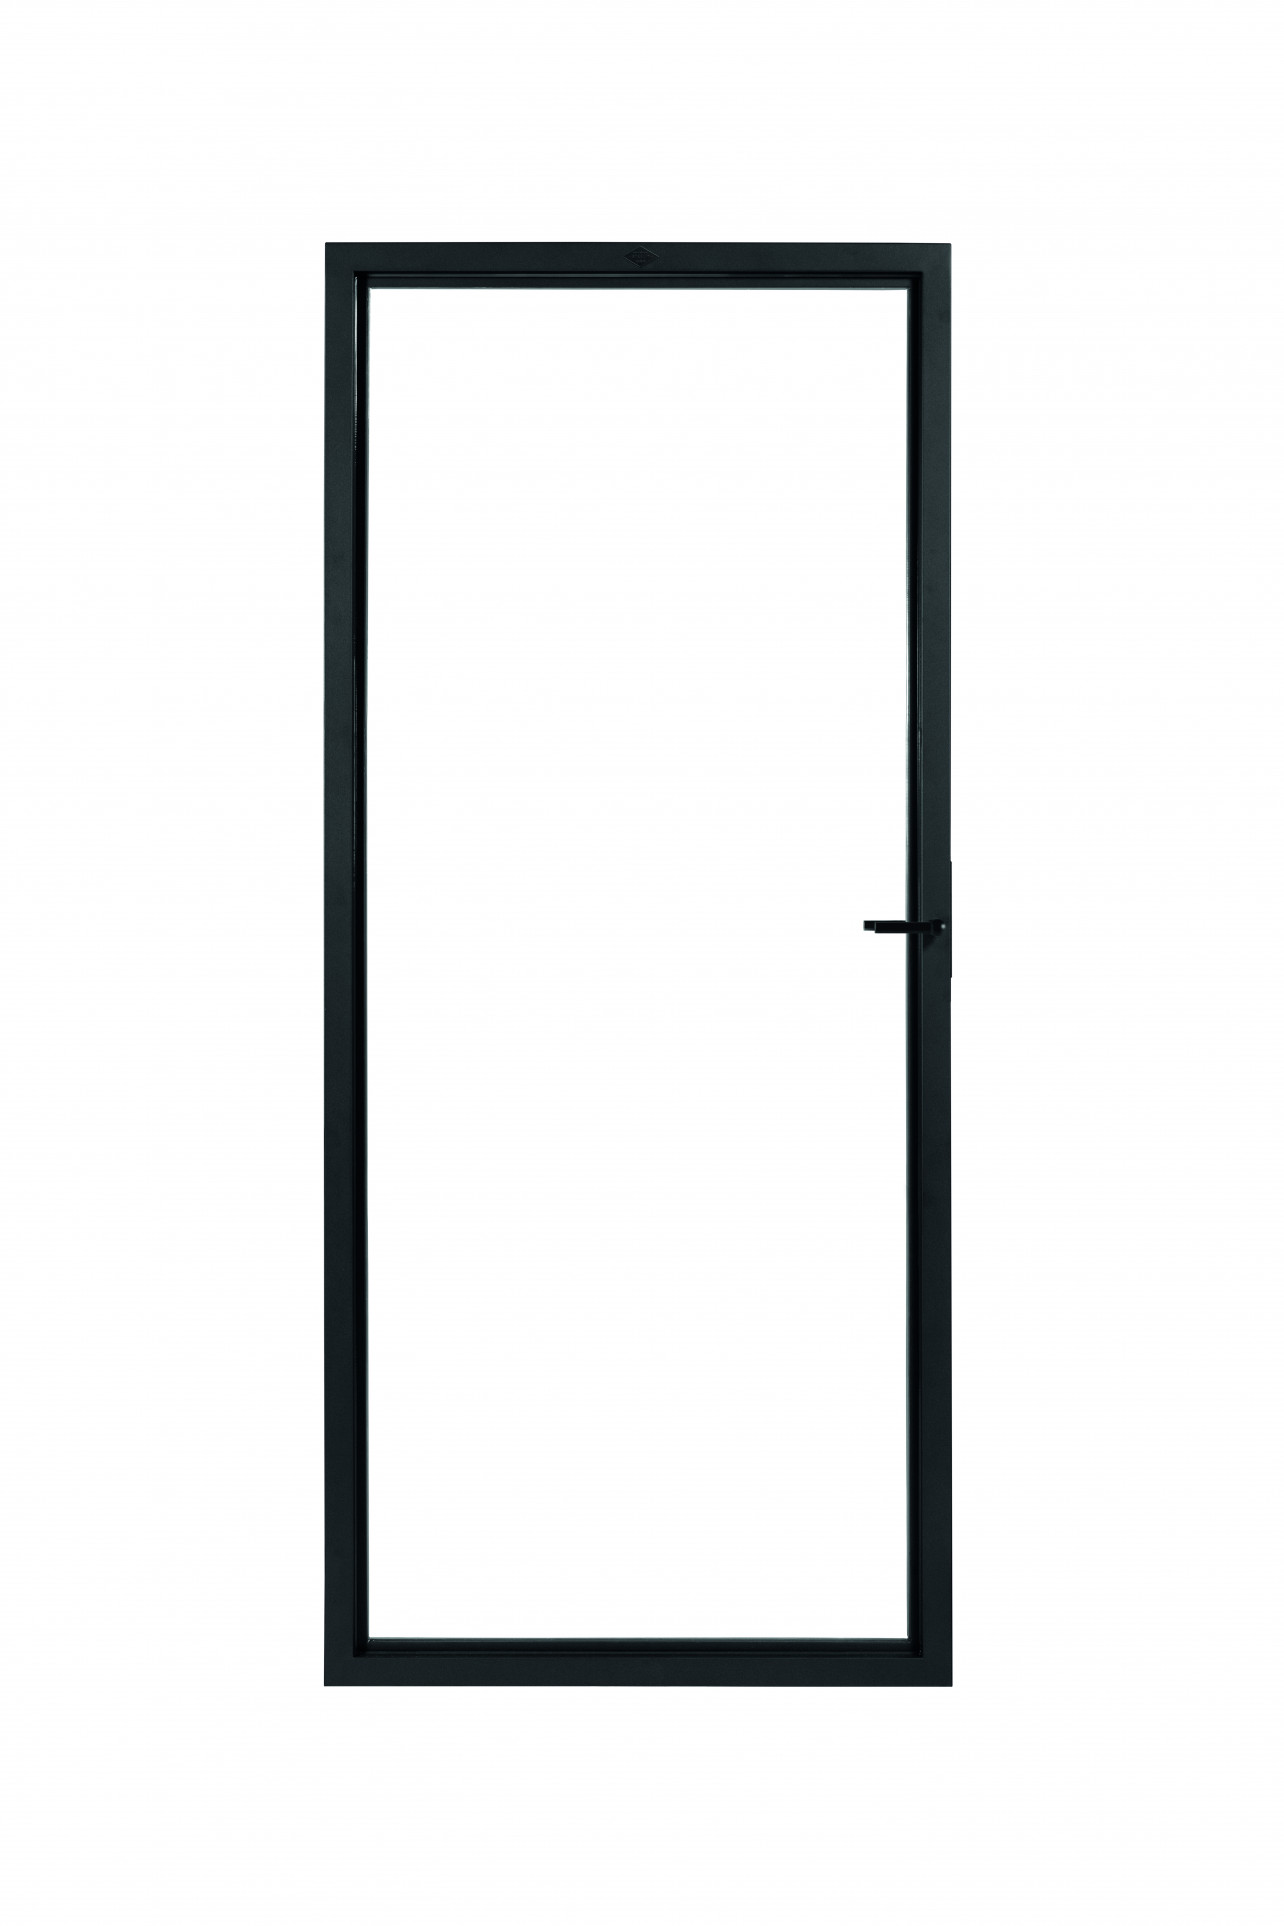 steelit-invisible-modernuni-enkel.jpg